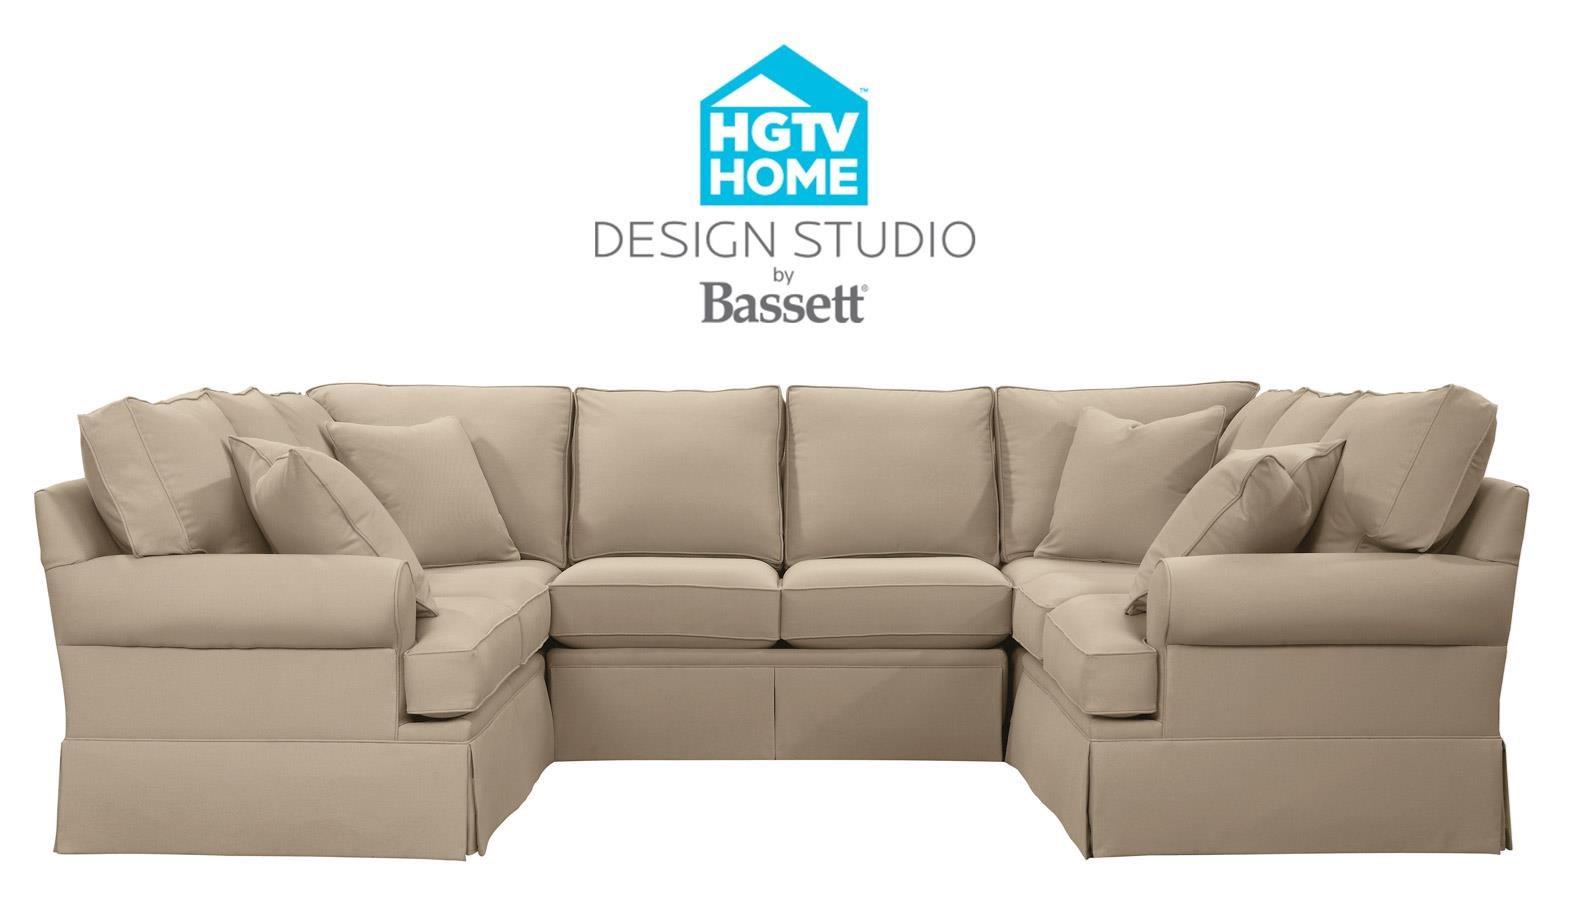 Bassett HGTV Home Design Studio Customizable U Shaped Sectional   Great  American Home Store   Sectional Modular Piece